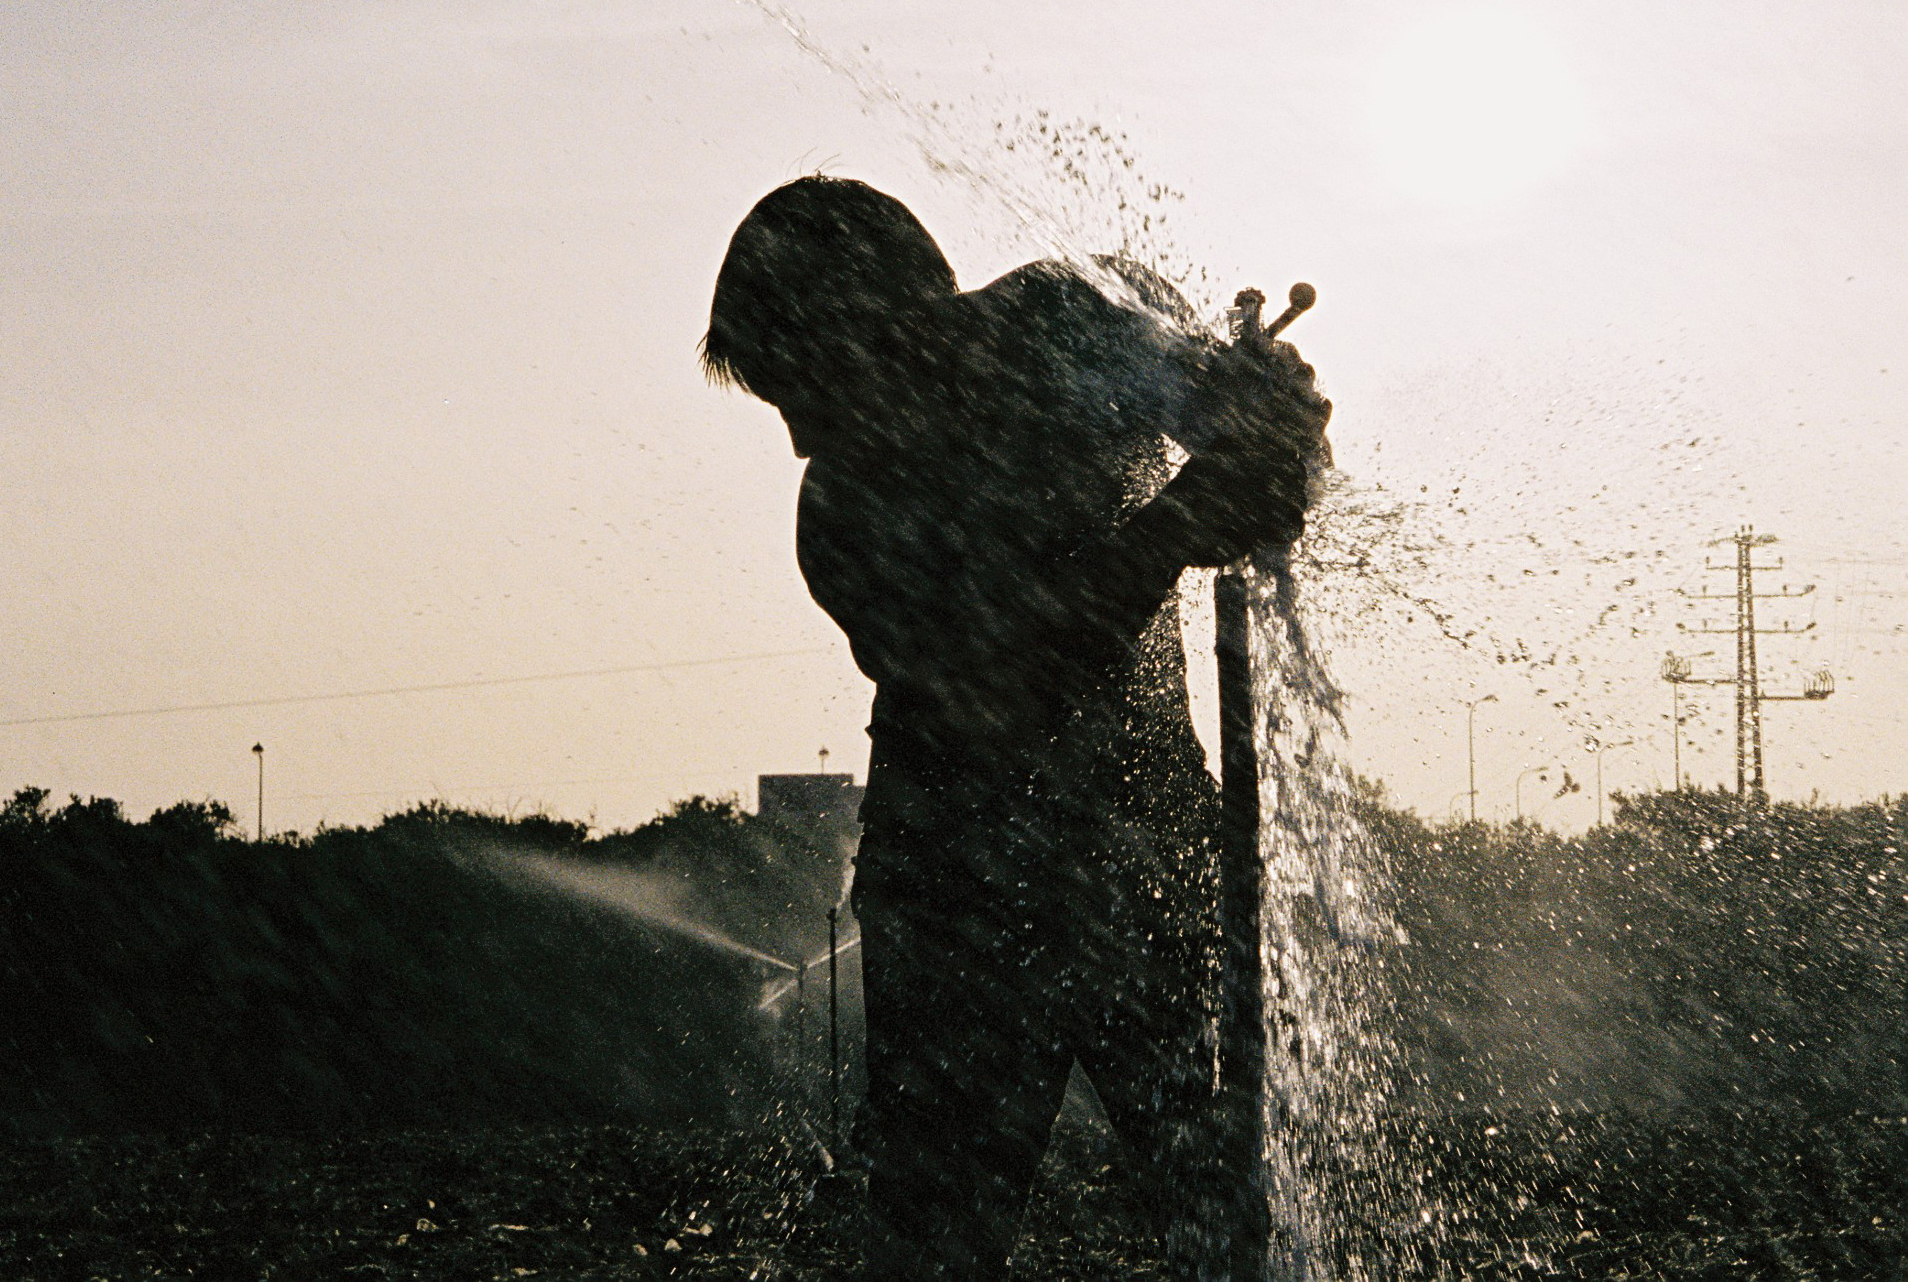 Israel pumps new water saving push as Sea of Galilee dives to